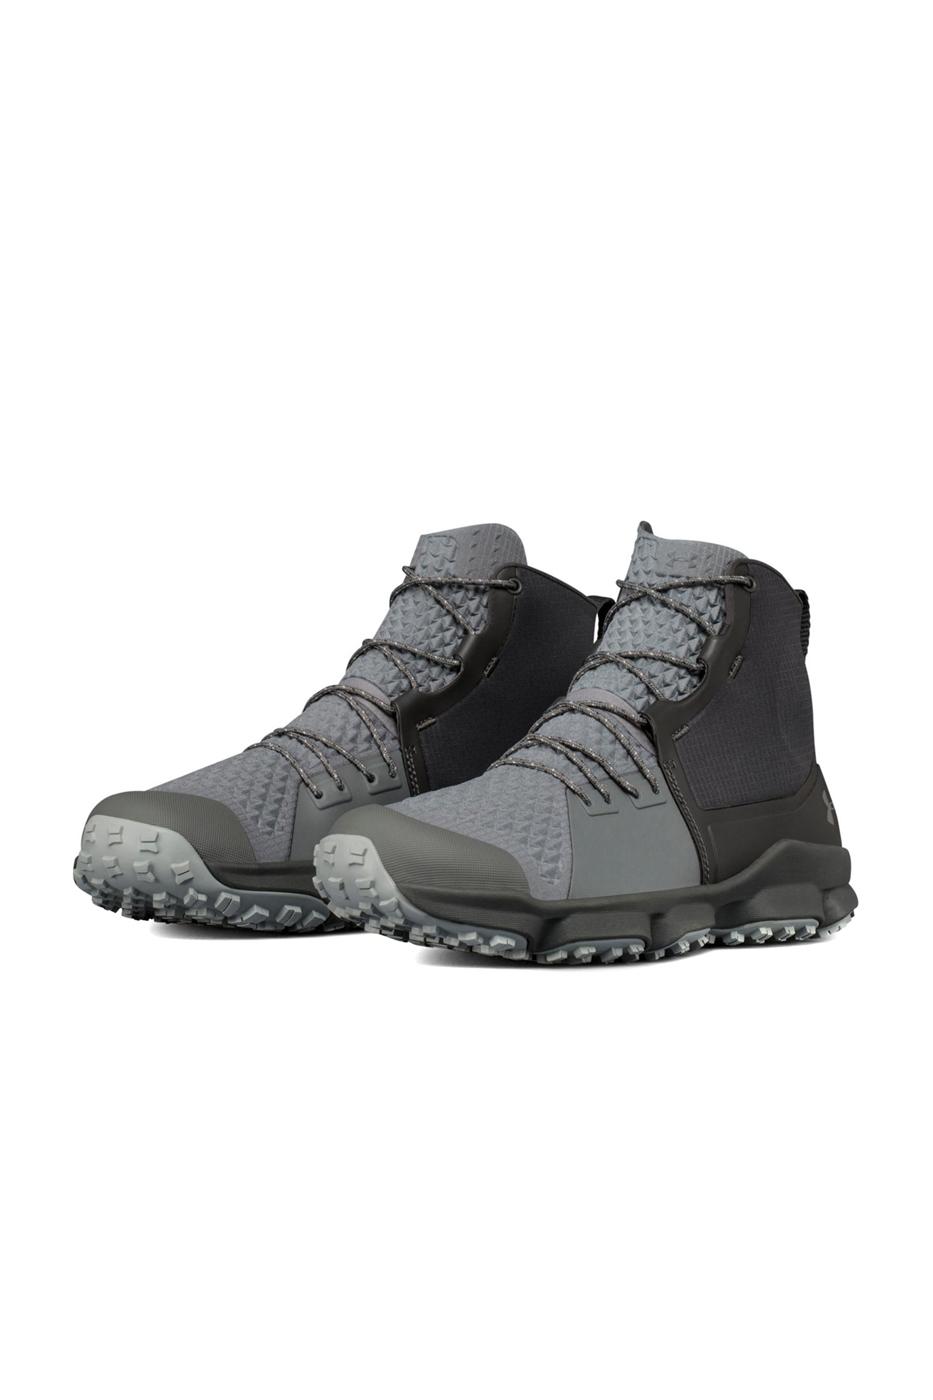 Ботинки для туризма Under Armour Speedfit 2.0 3000305-102